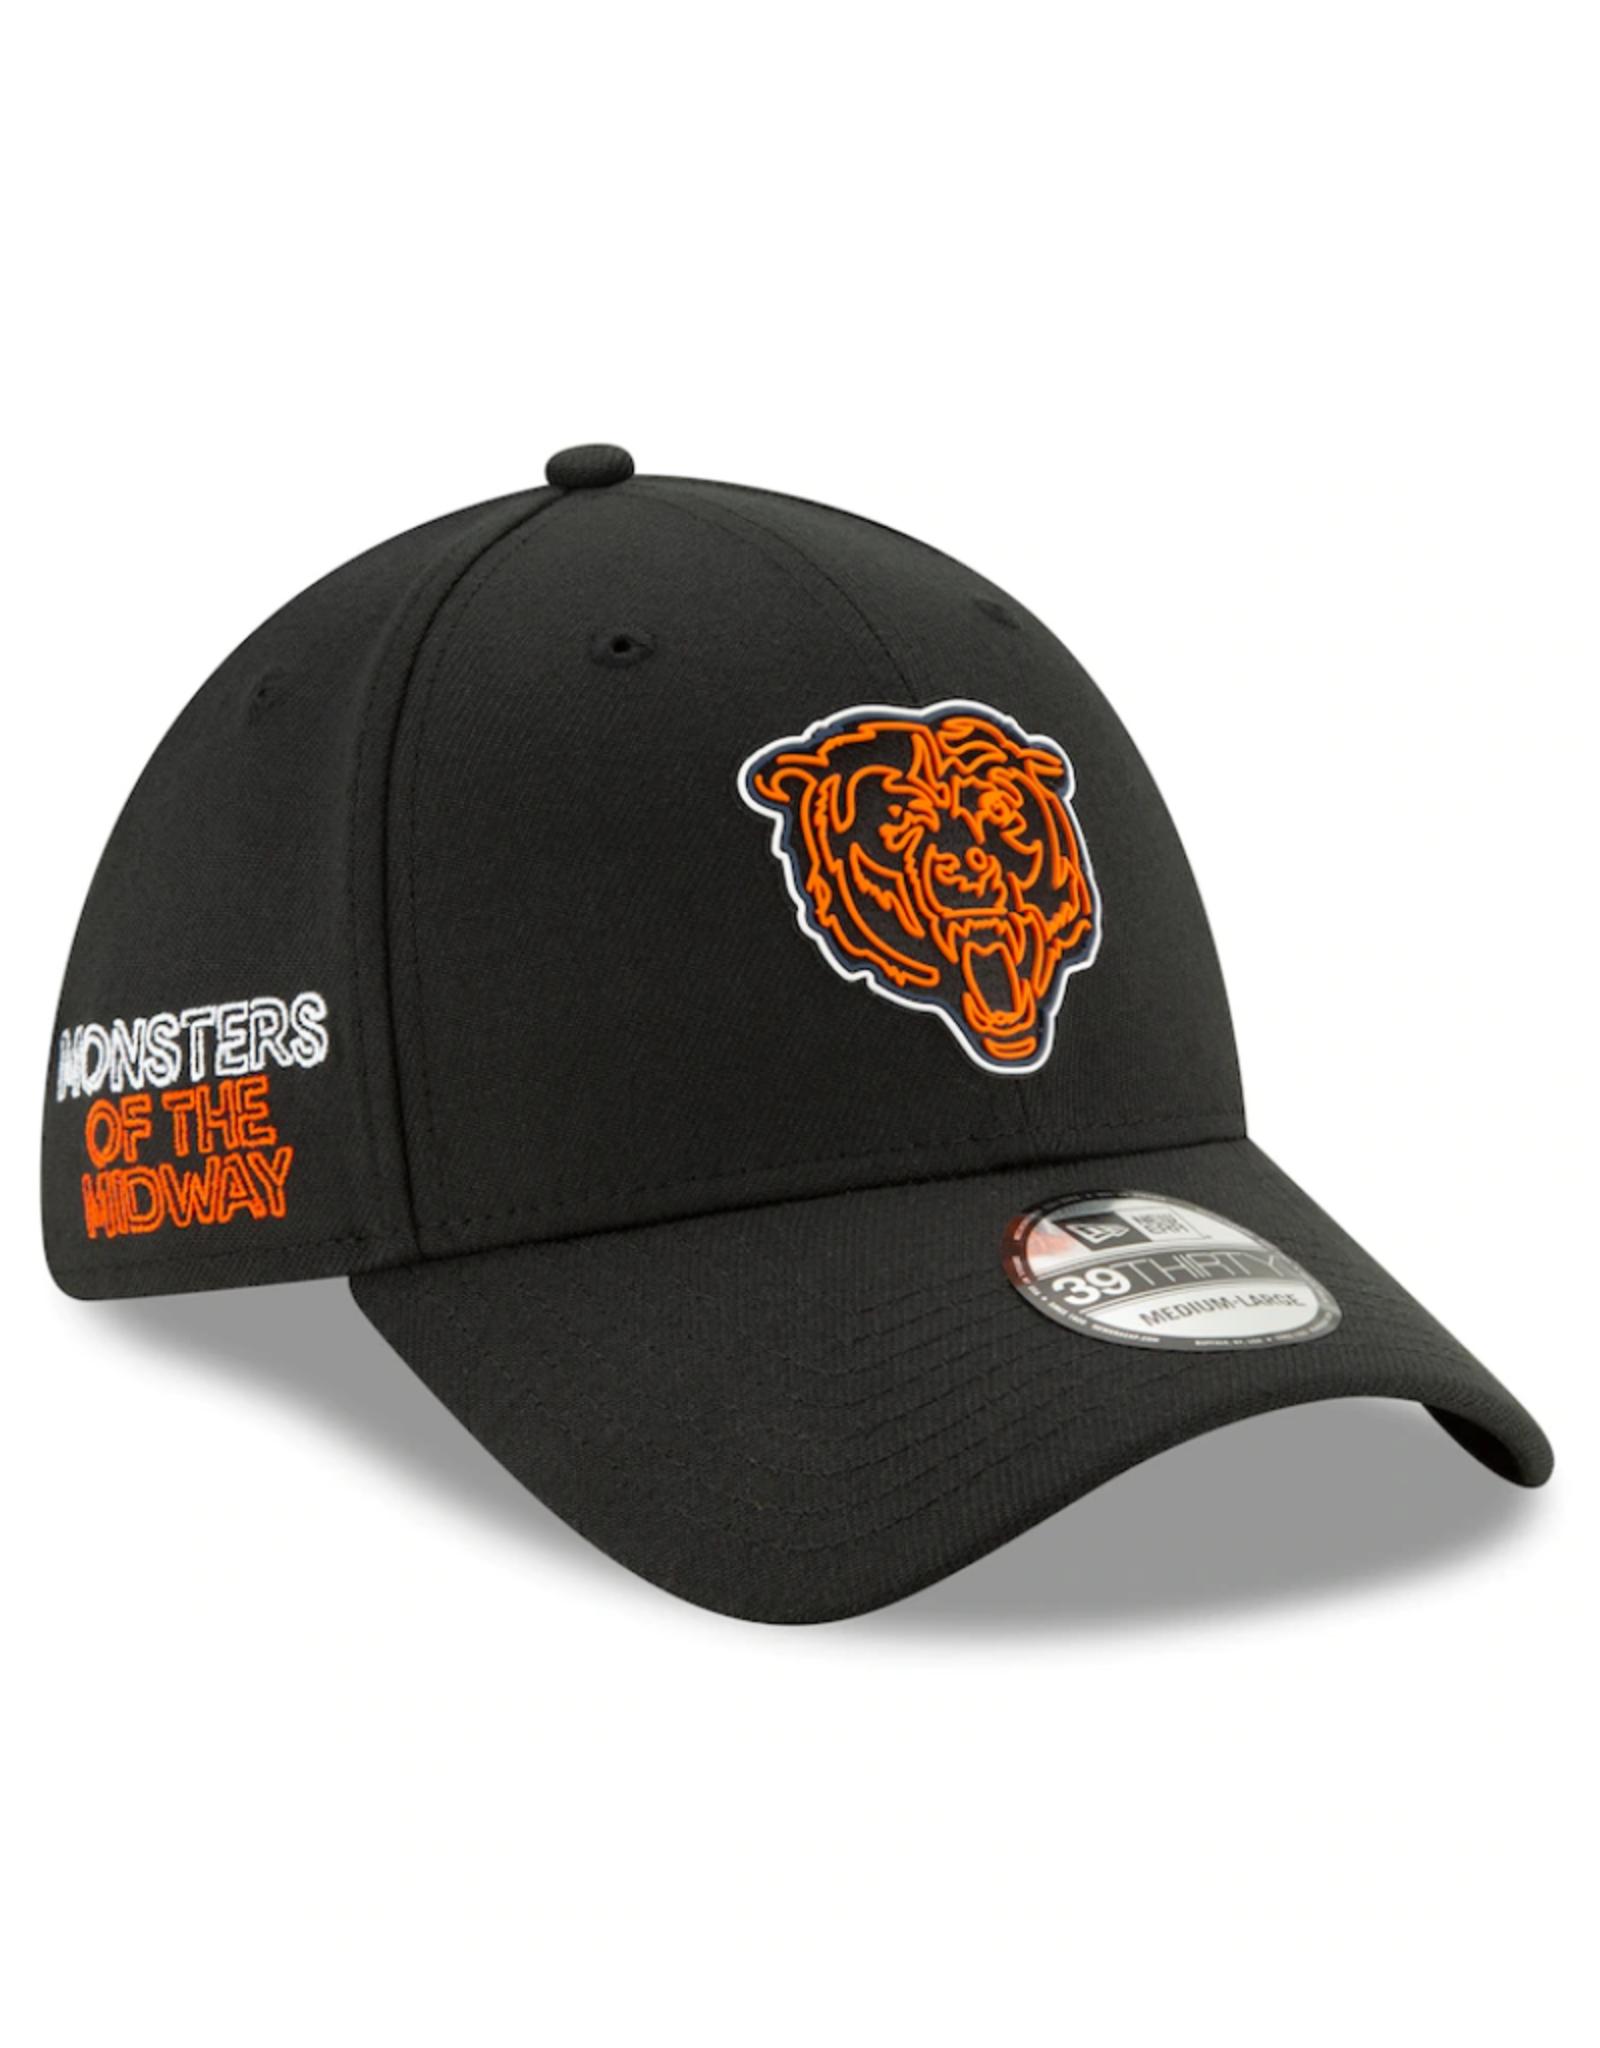 New Era '20 NFL Draft Men's 39THIRTY Hat Chicago Bears Black